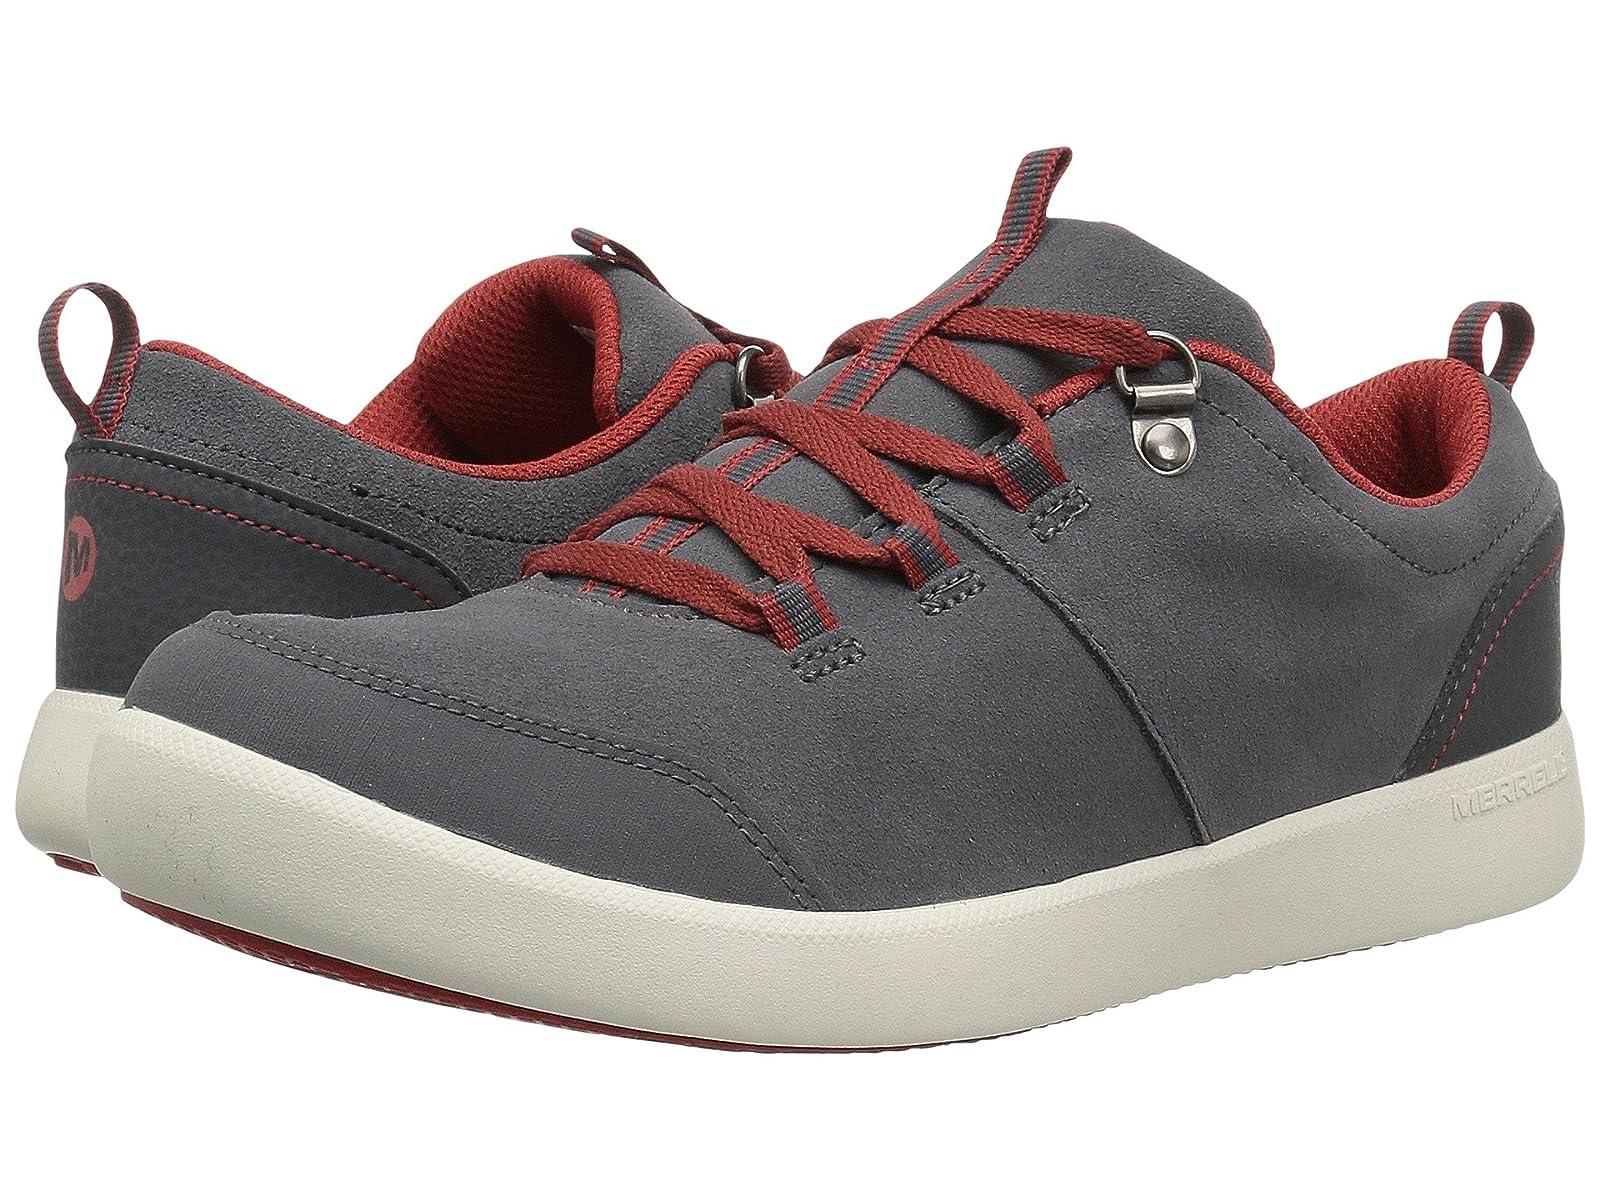 Merrell Kids Freewheel LTT (Big Kid)Atmospheric grades have affordable shoes